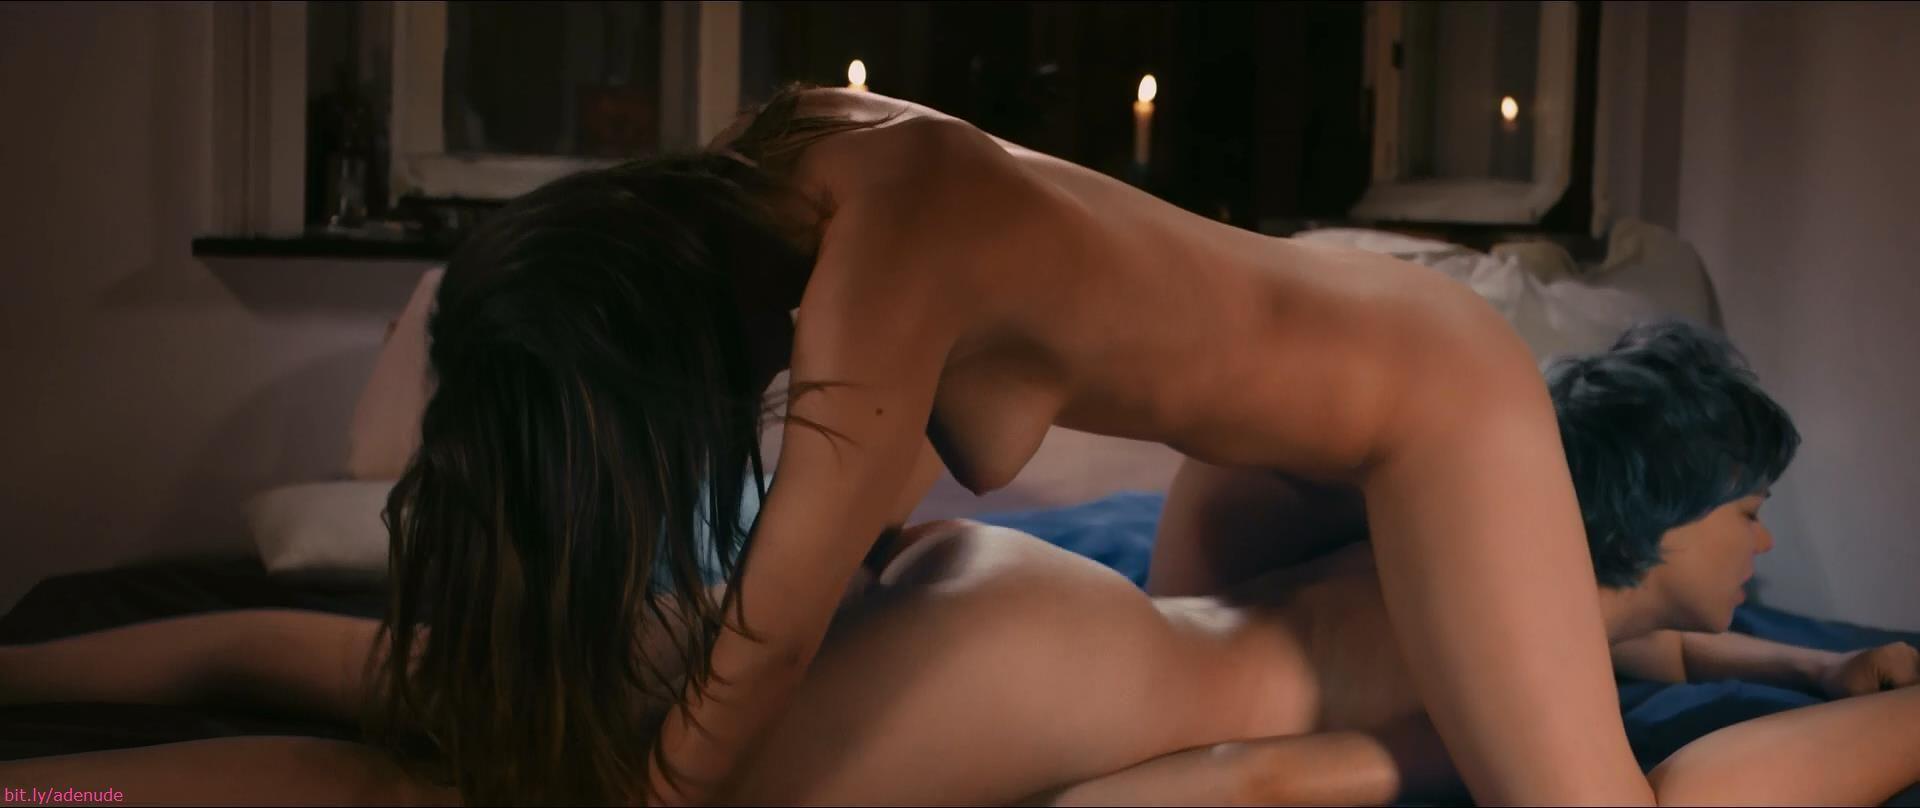 Adele exarchopoulos nude sex scene in le fidele 2